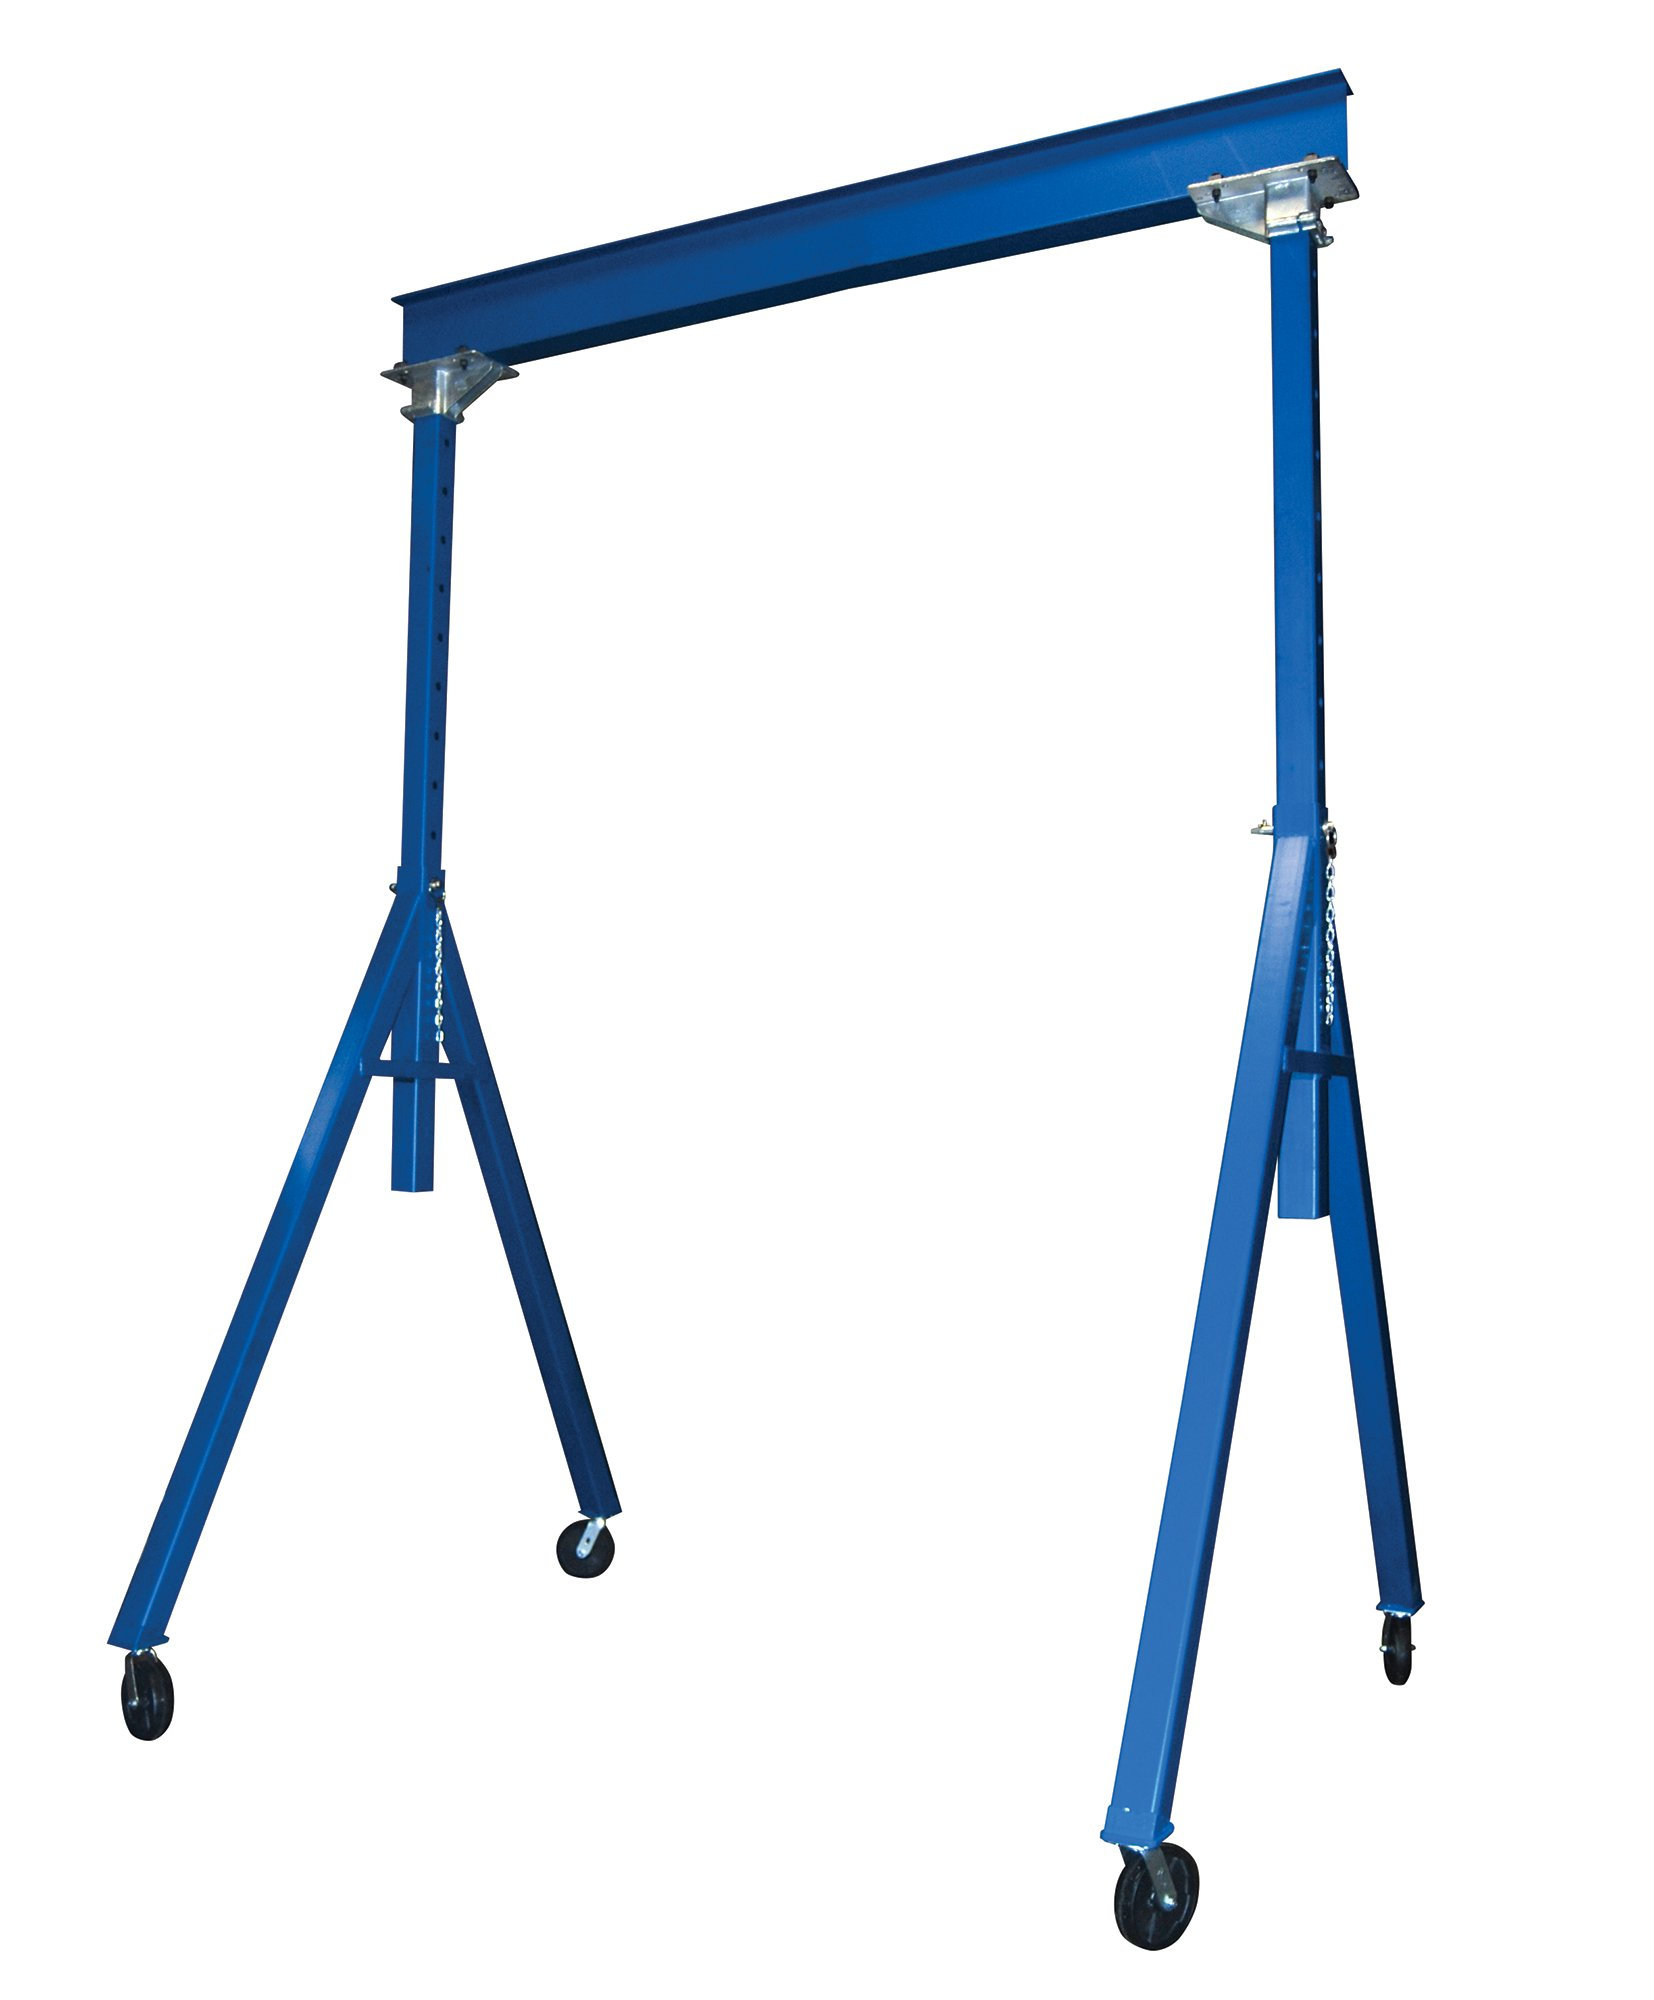 Vestil AHS-6-20-16 Steel Adjustable Height Gantry Crane, 6000 lbs Capacity, 20' Length x 12'' Height Beam, 127''-193'' Usable Height